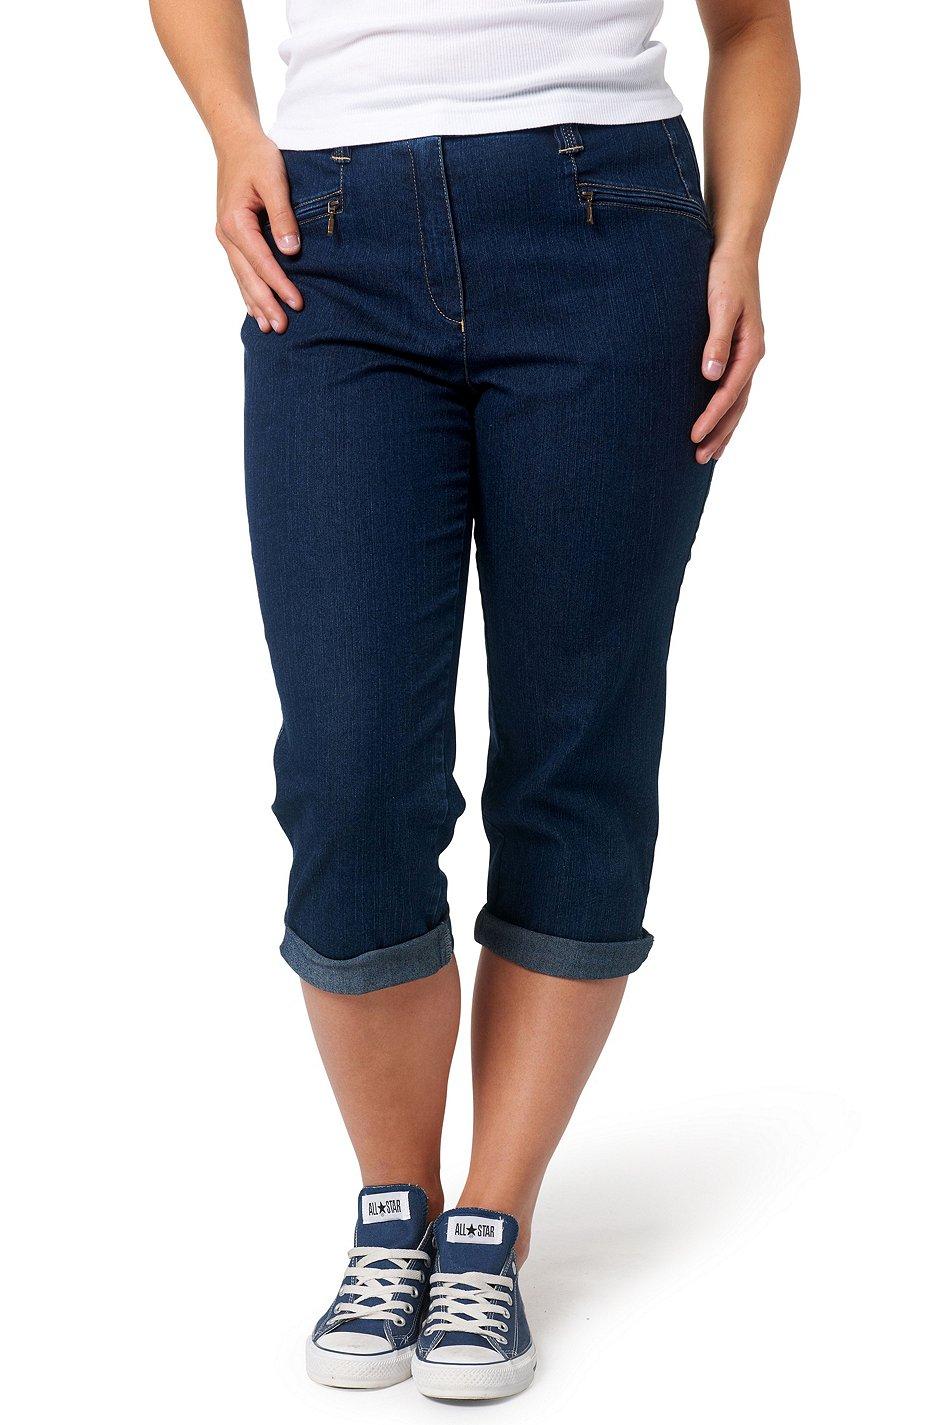 ULLA POPKEN BASICS 7/8 Jeans Mony Stretch dunkelblau NEU Gr. 50